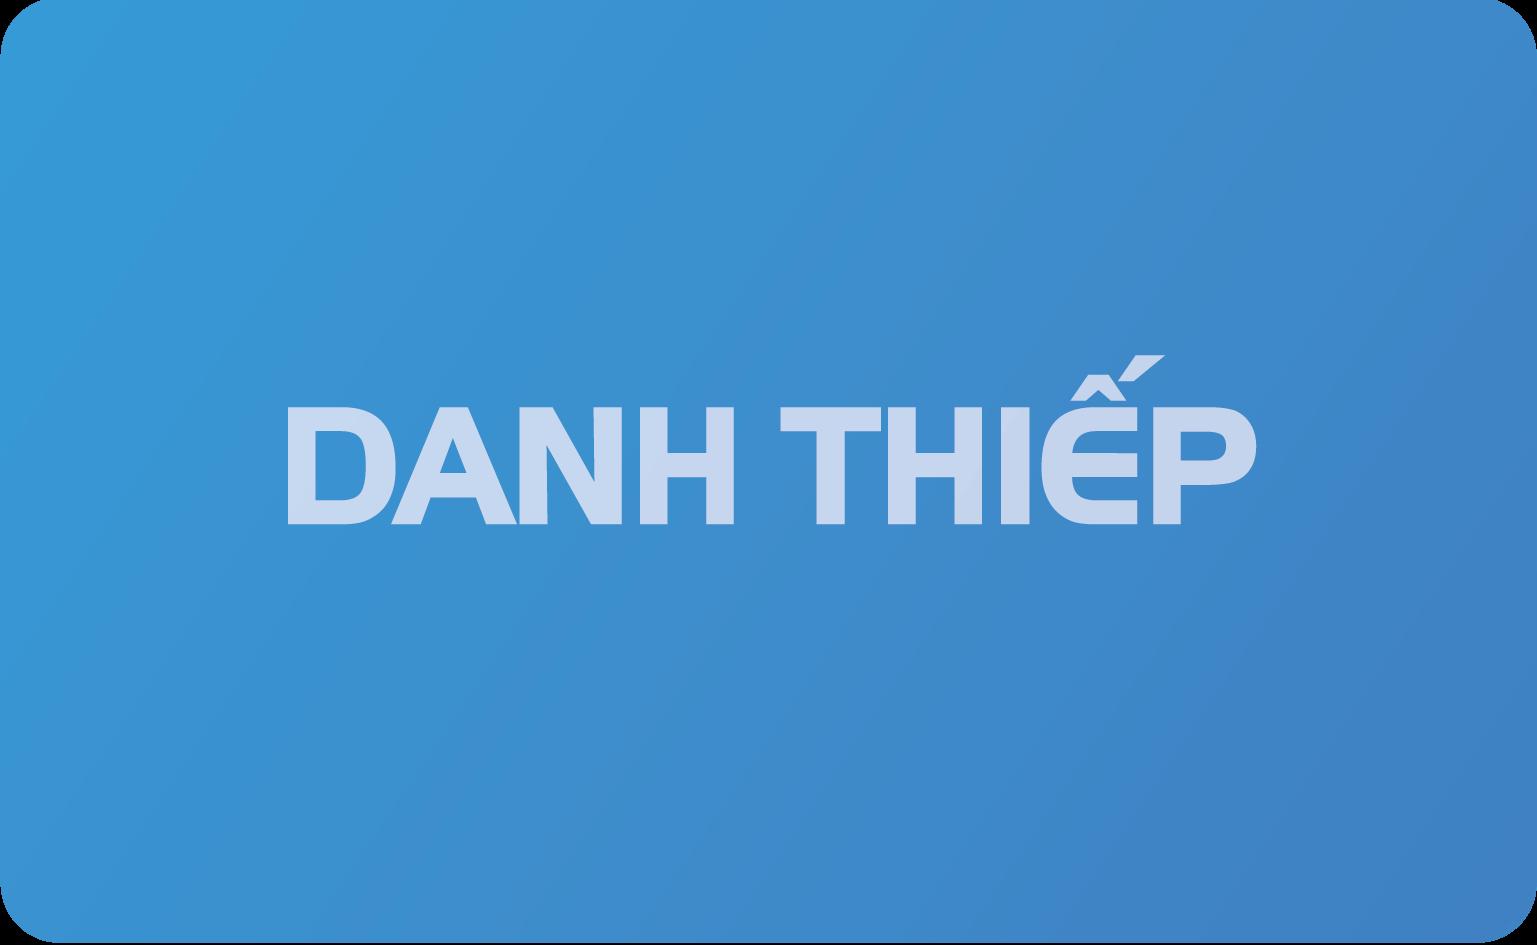 danh-thiep